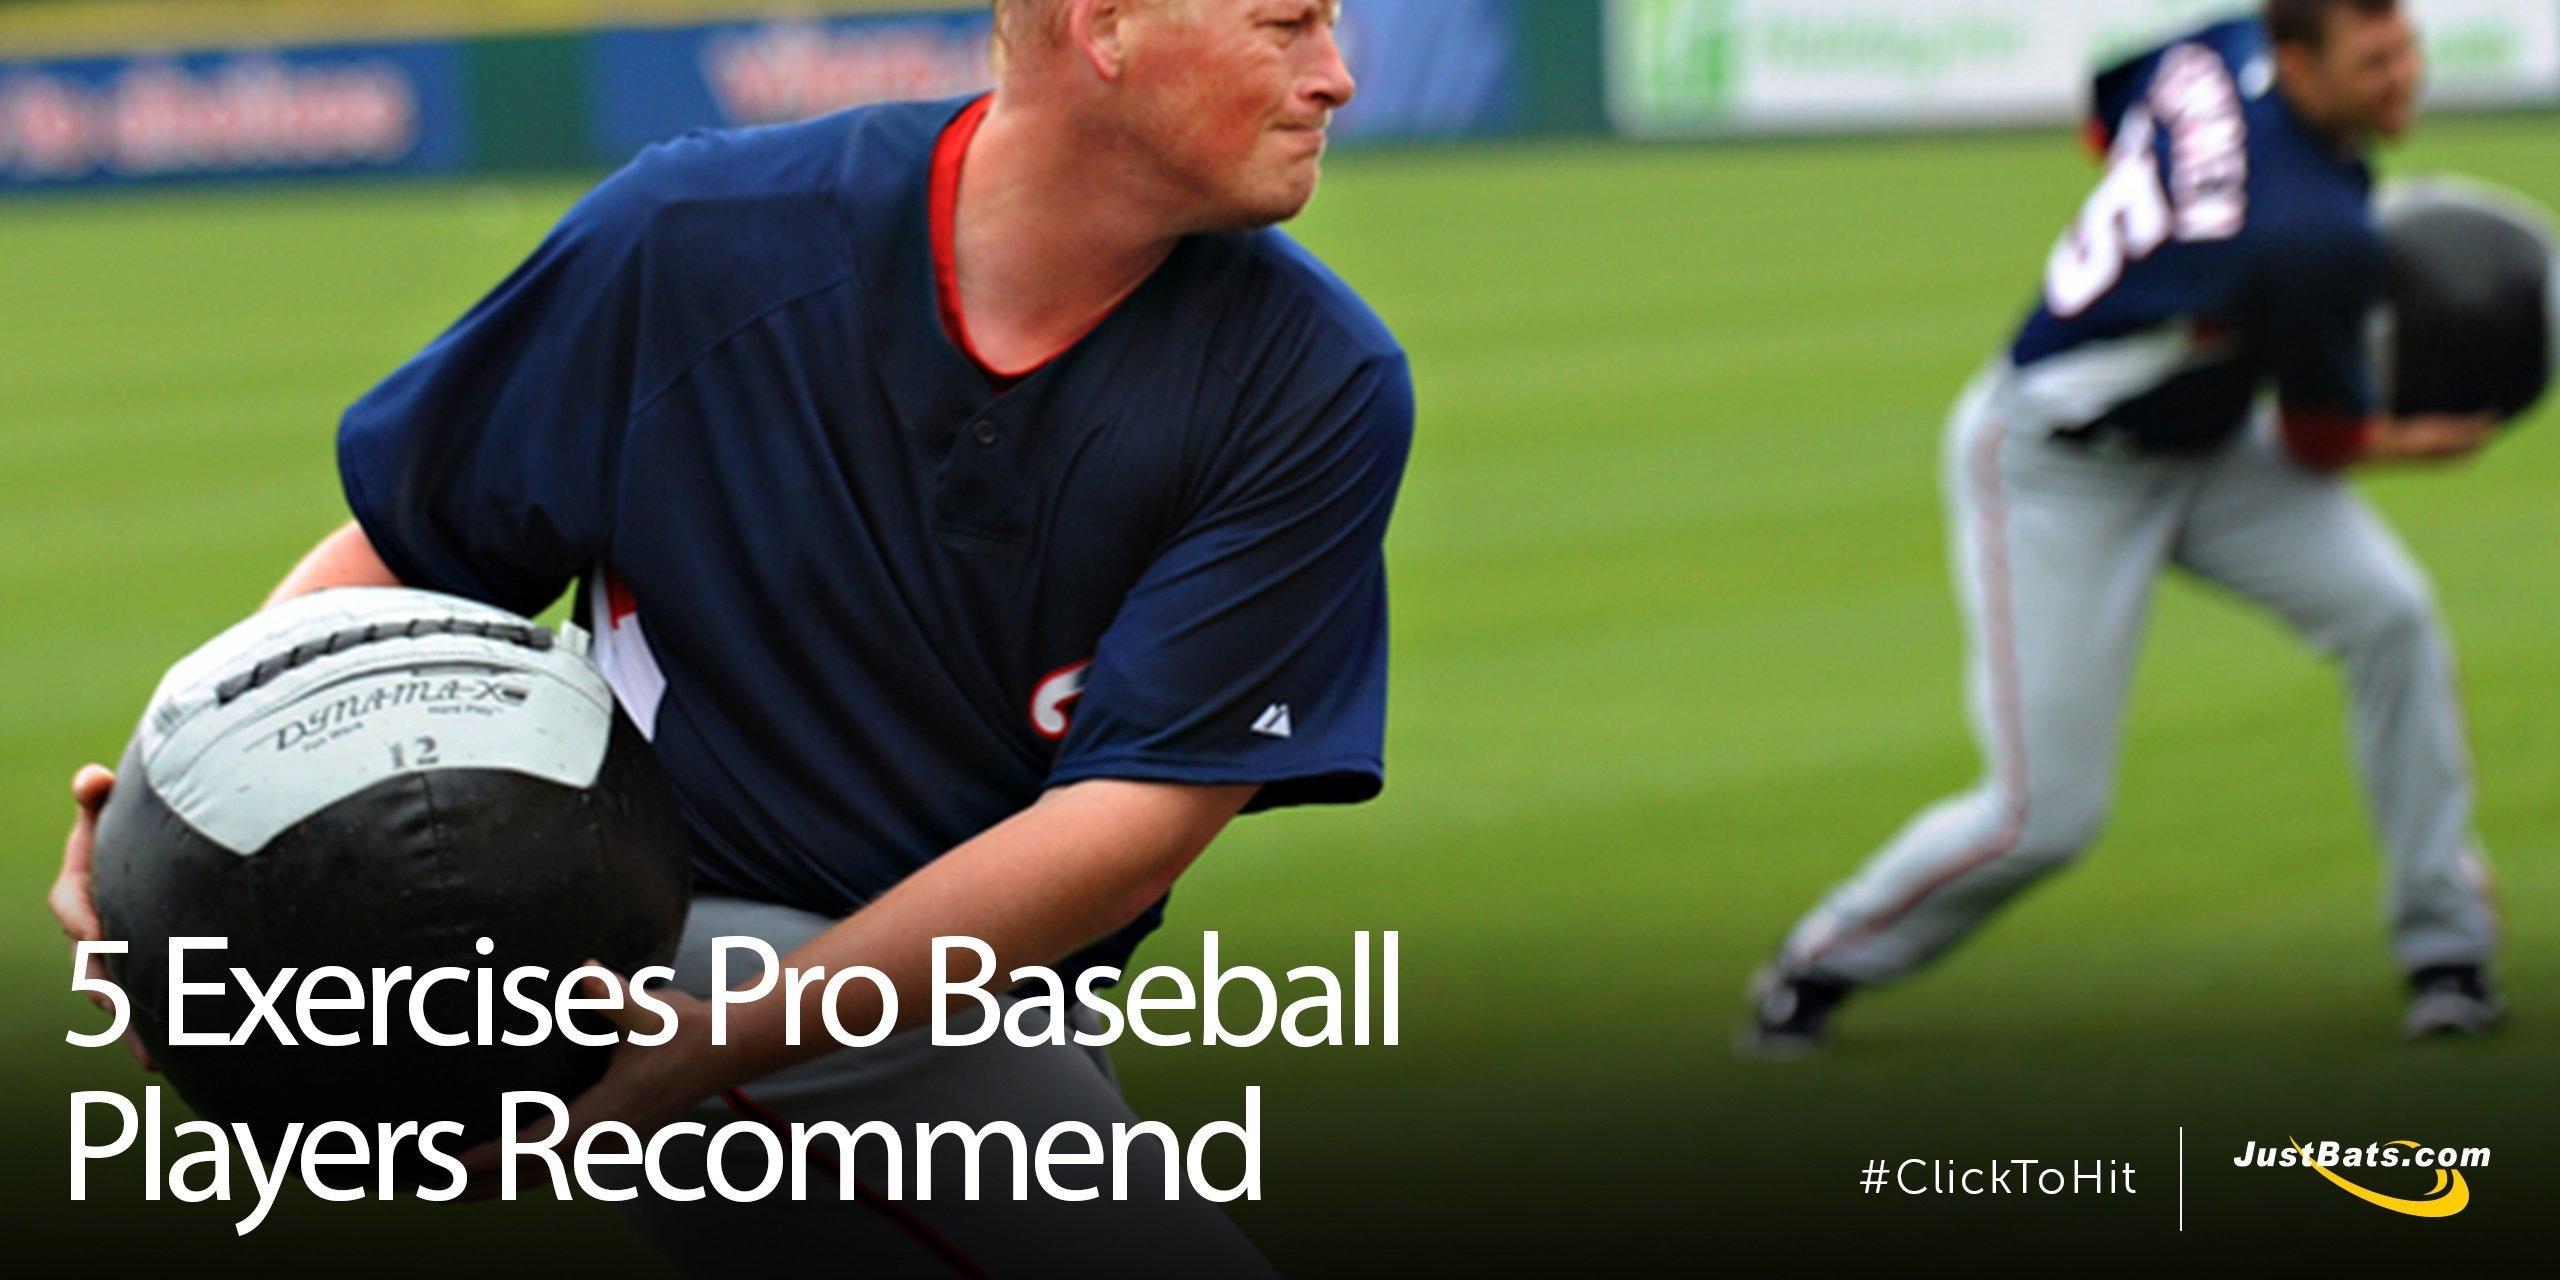 5 Exercises Pro Baseball Players Recommend - Blog.jpg